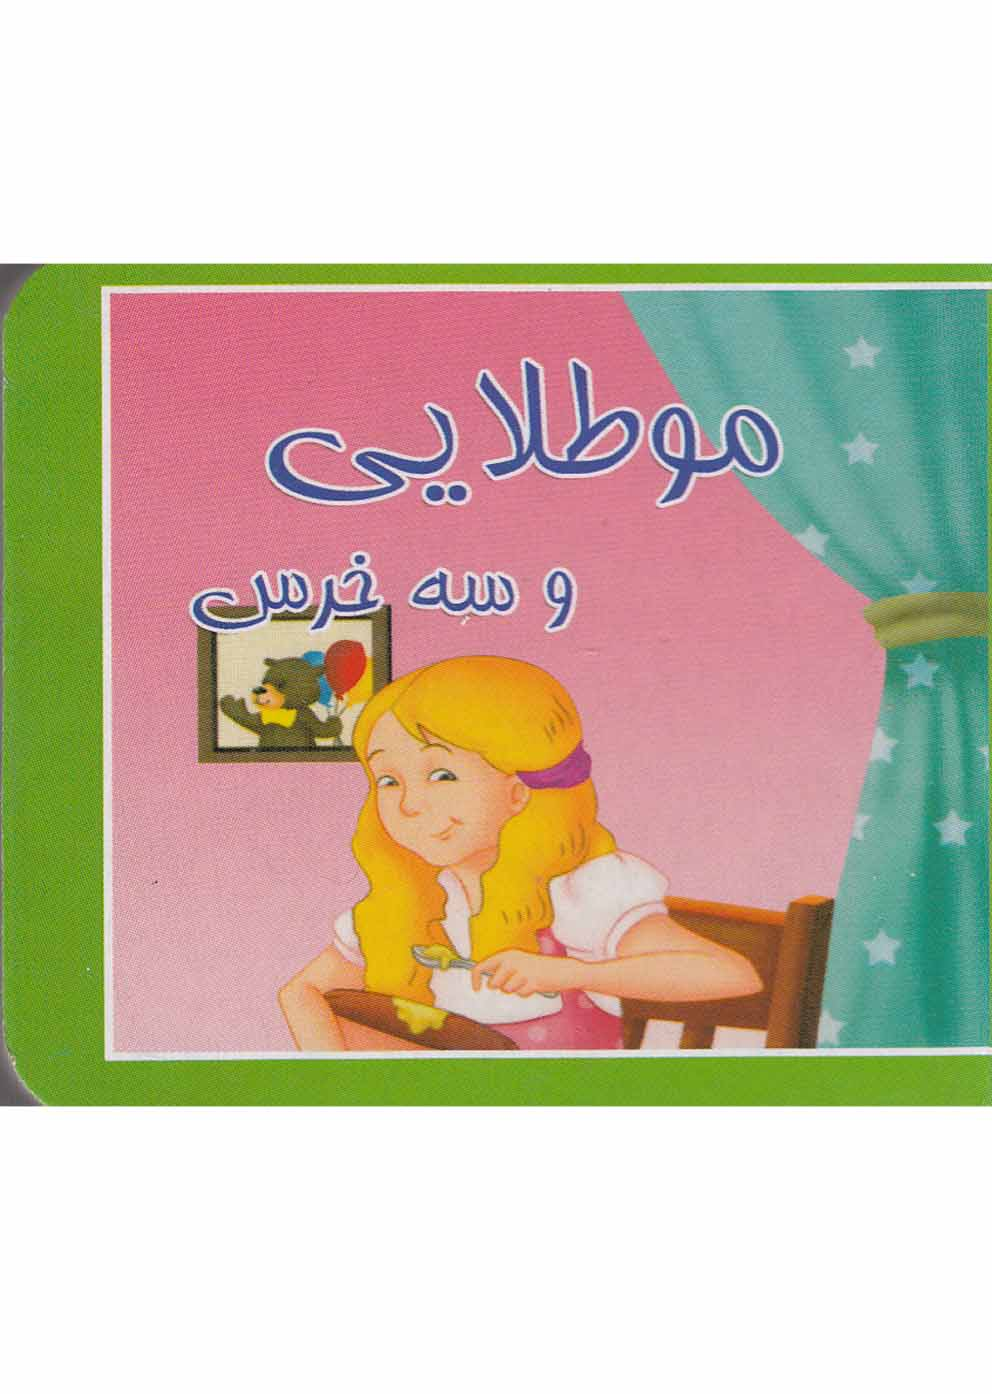 کتاب کوچک(موطلاییوسهخرس)سایهگستر #